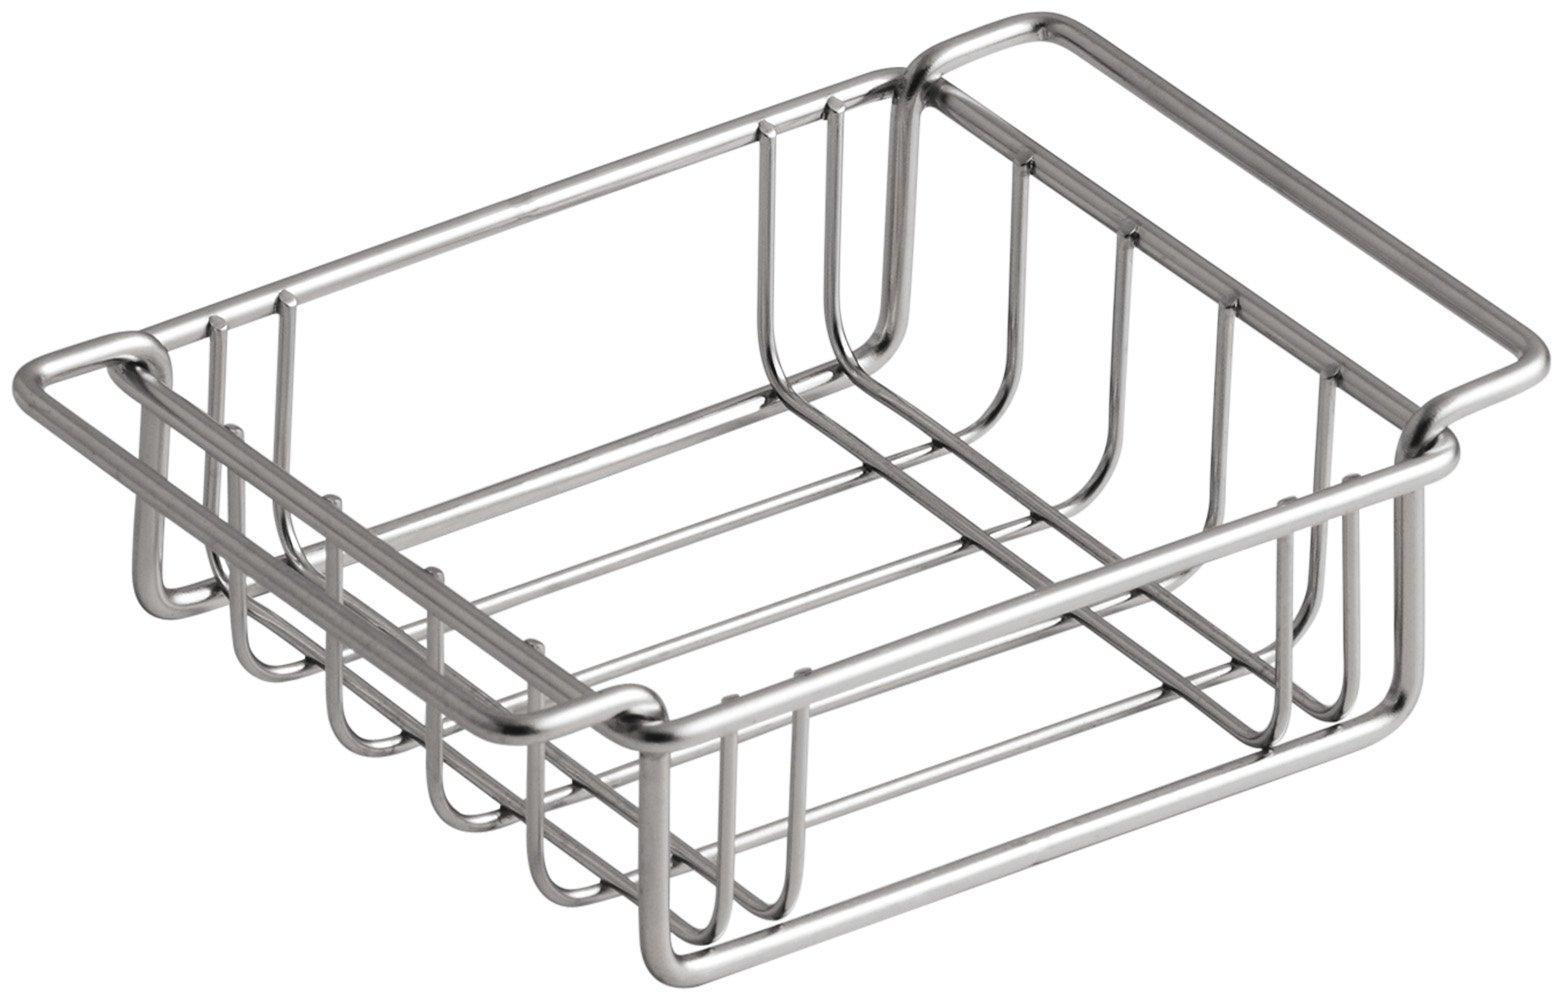 KOHLER K-3127-ST Wire Storage Basket, Fits Undertone Trough Sinks, Stainless Steel